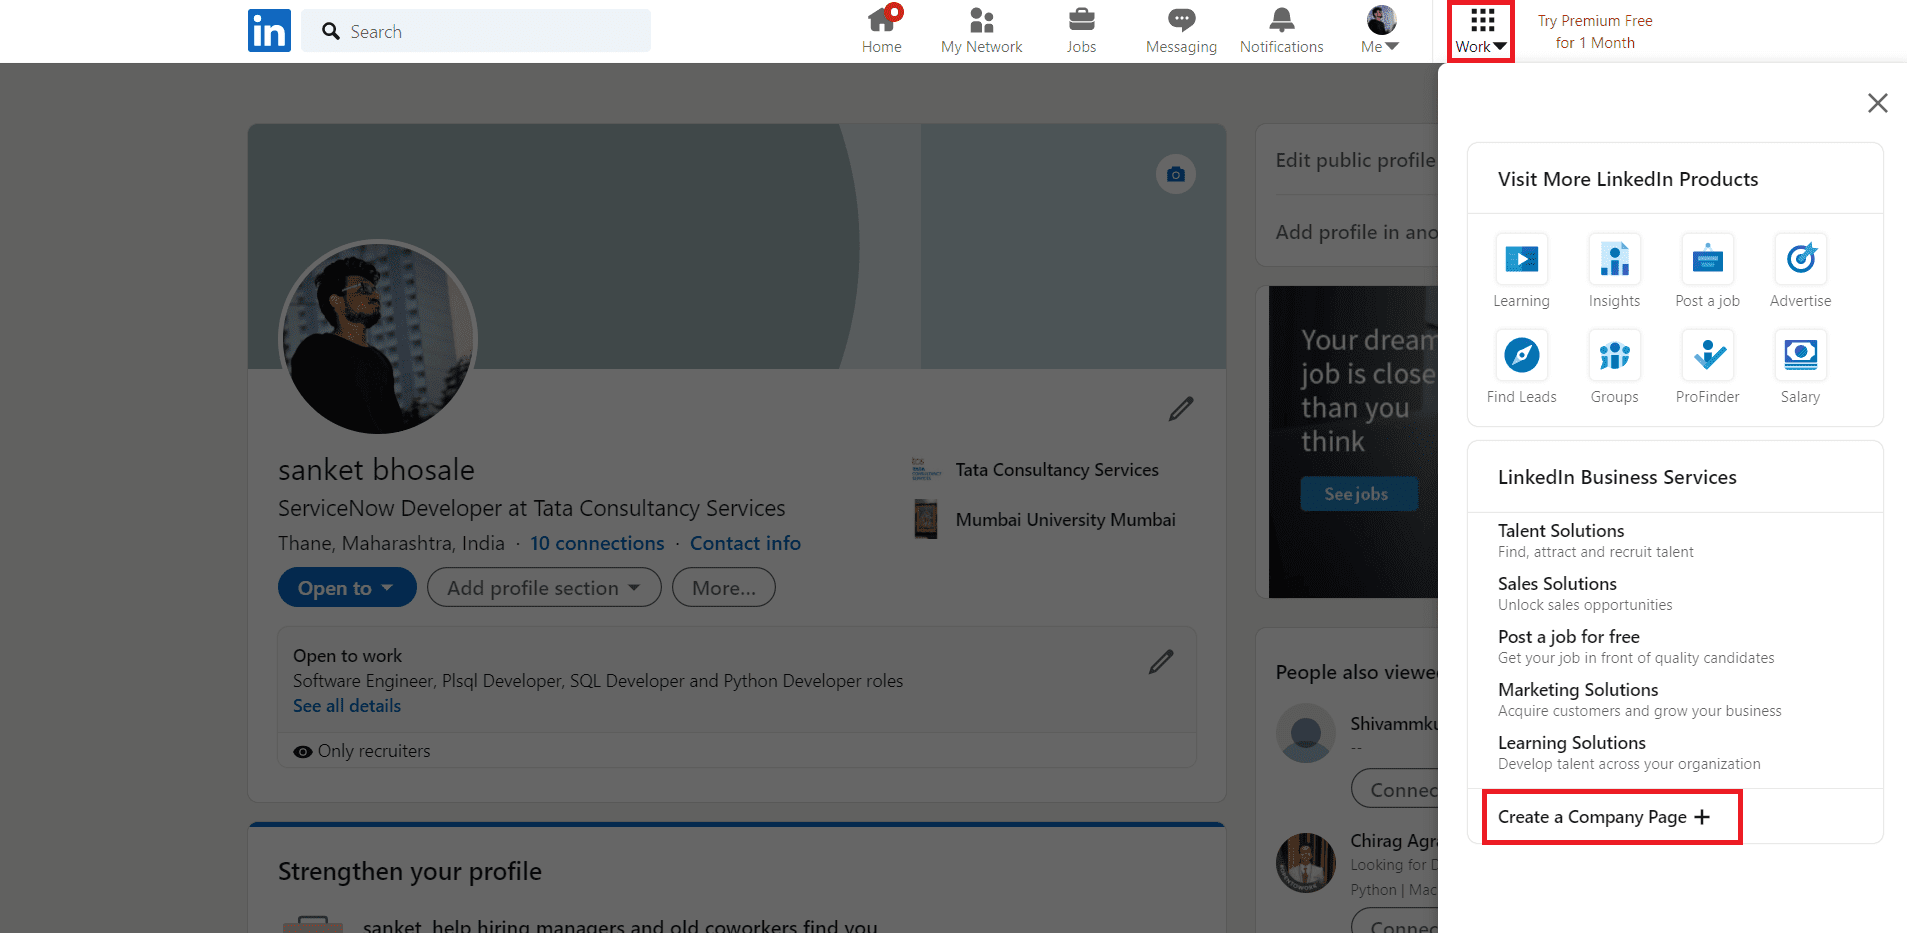 How to add LinkedIn company page